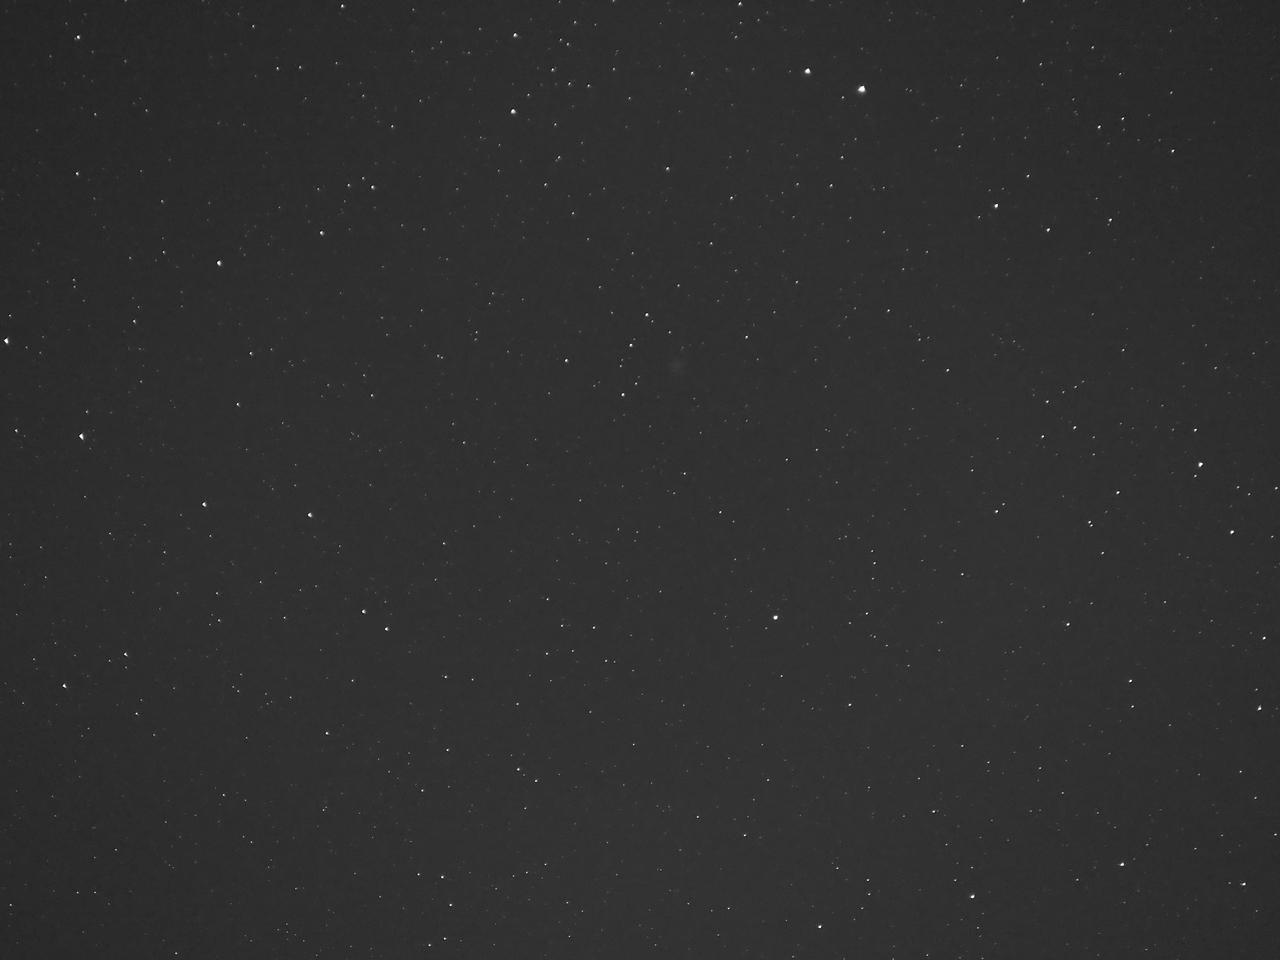 NGC5897.jpg